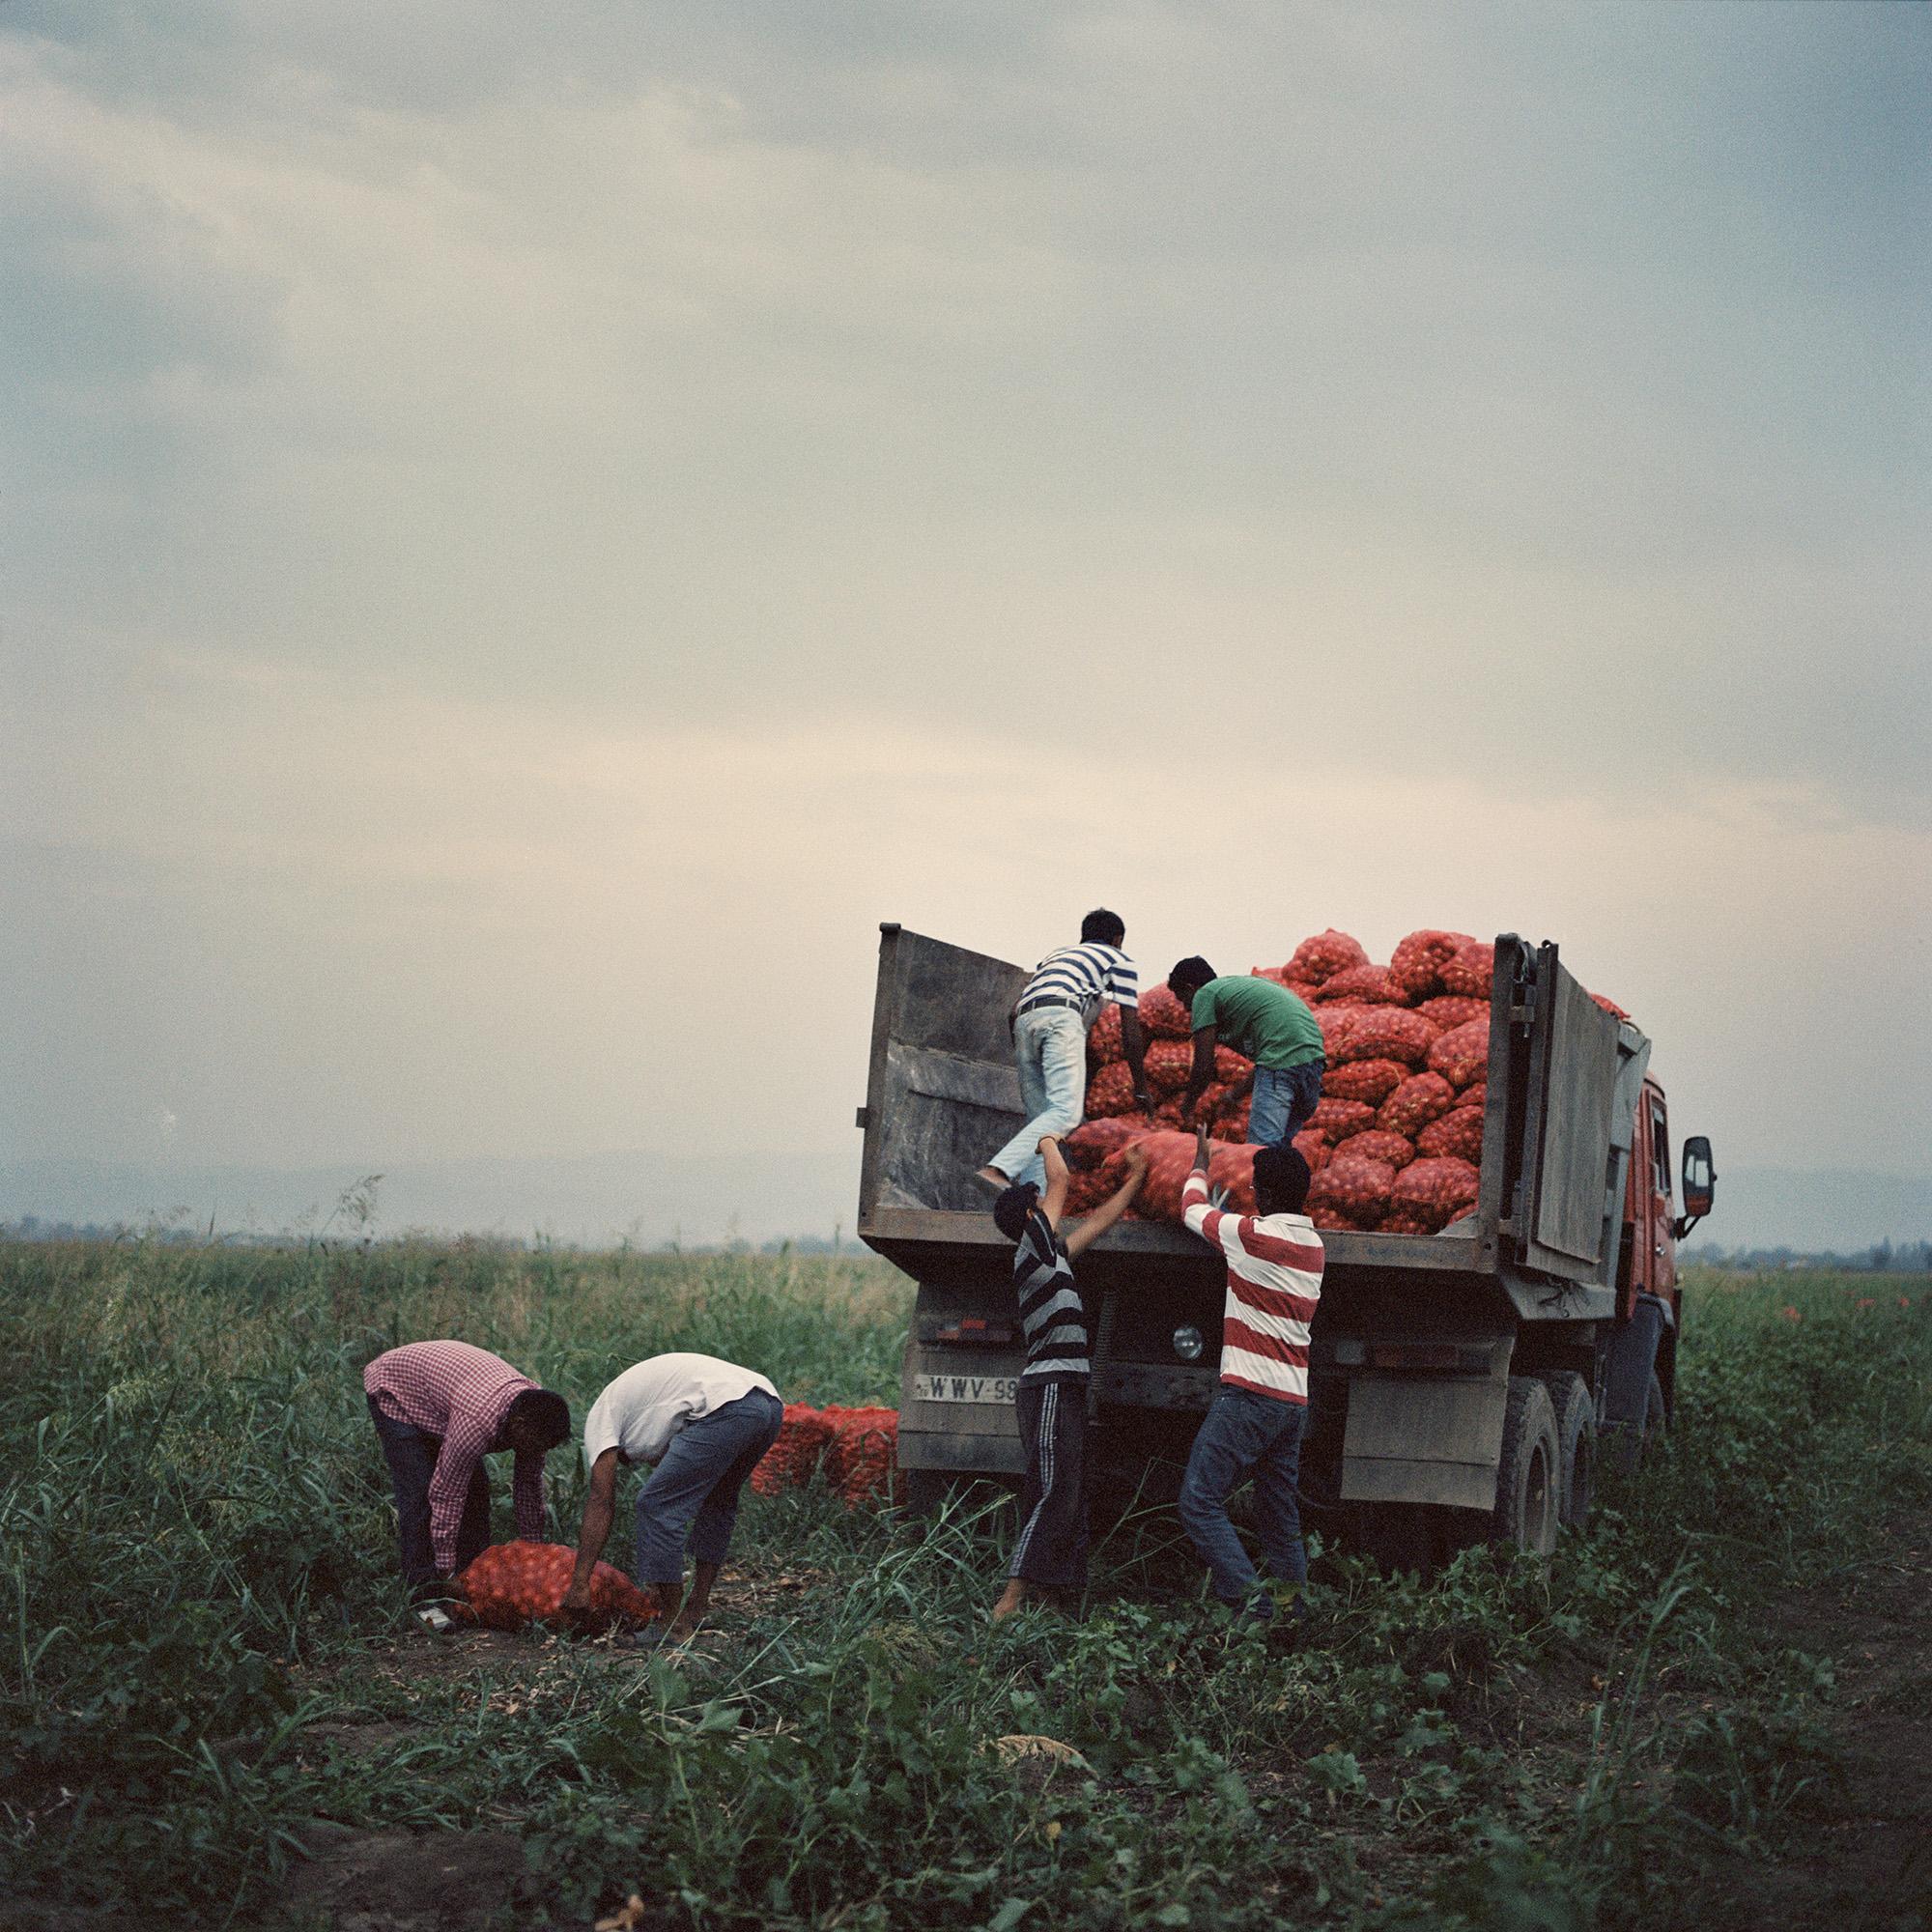 Sikh farmers_20.jpg